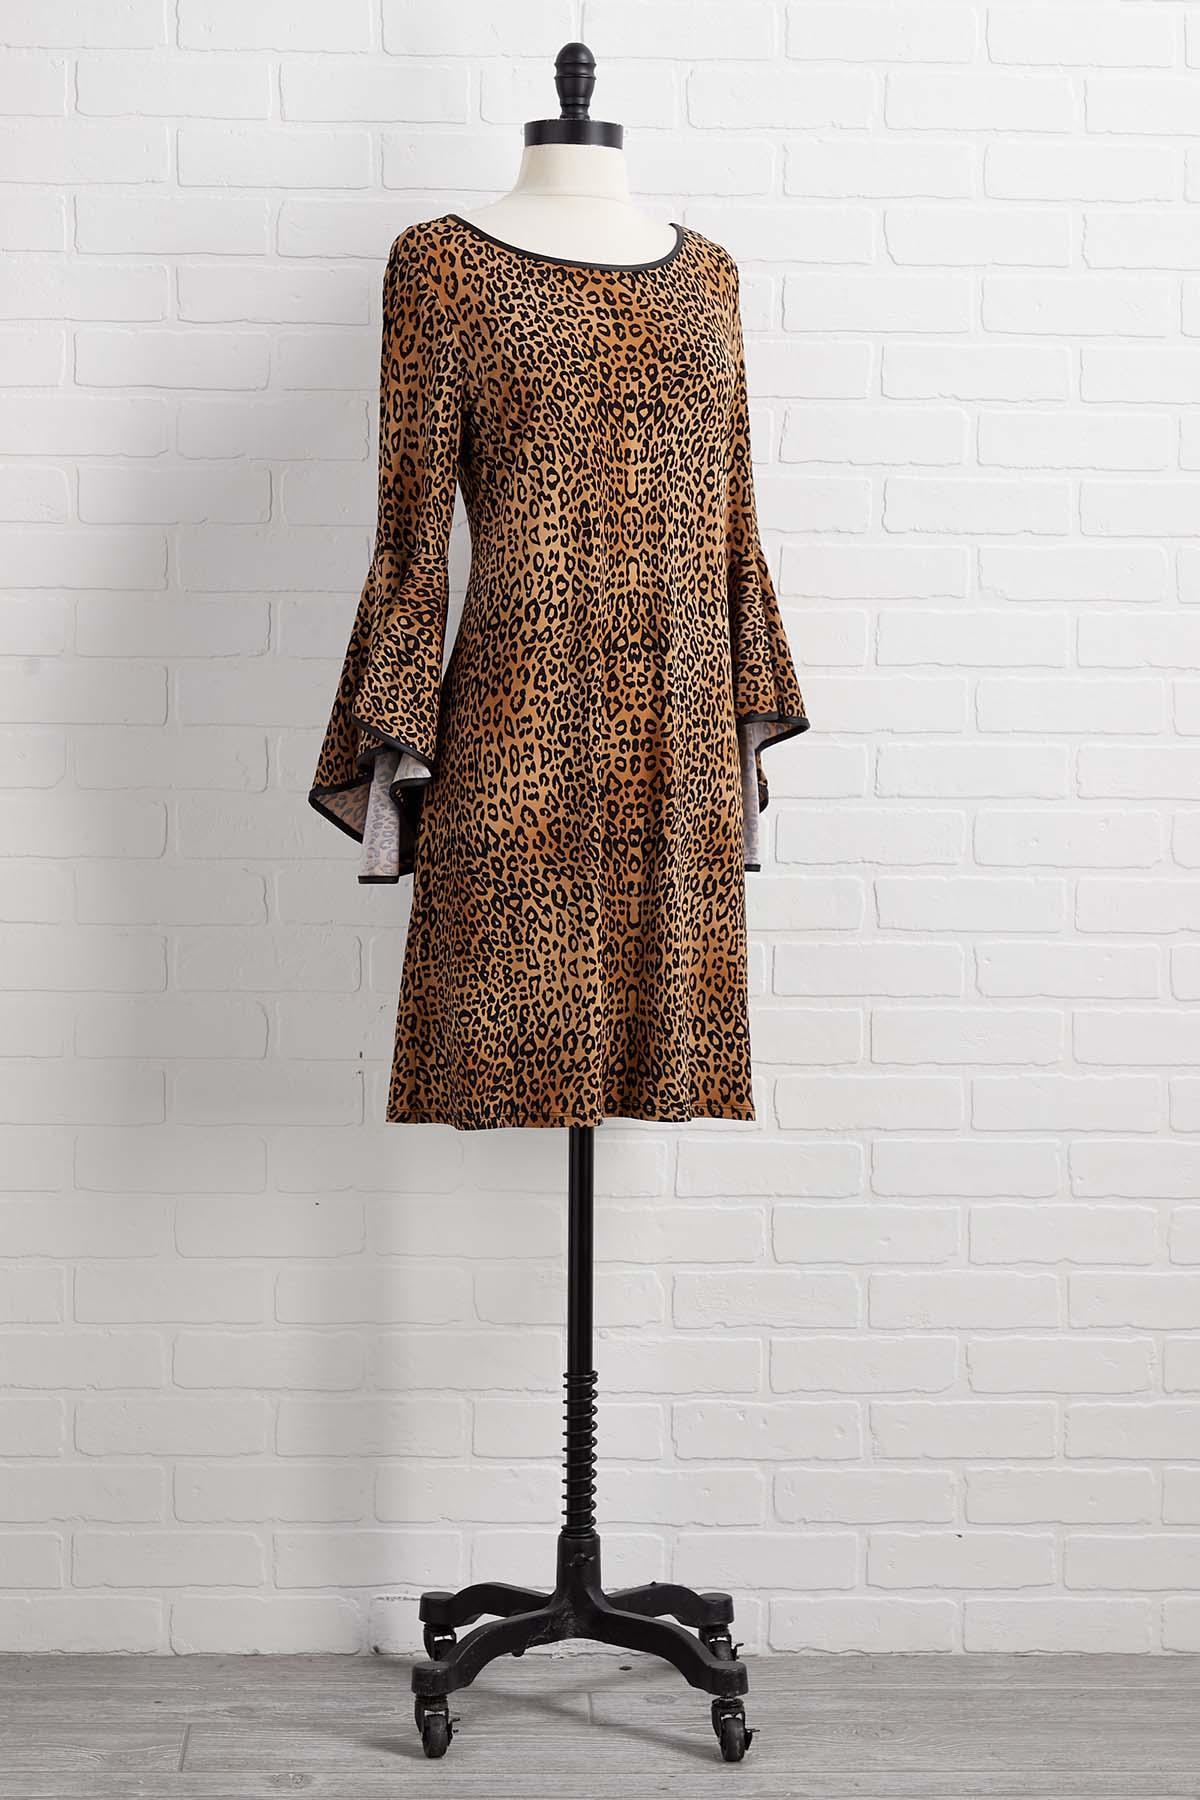 Wild Medium Or Hot Dress